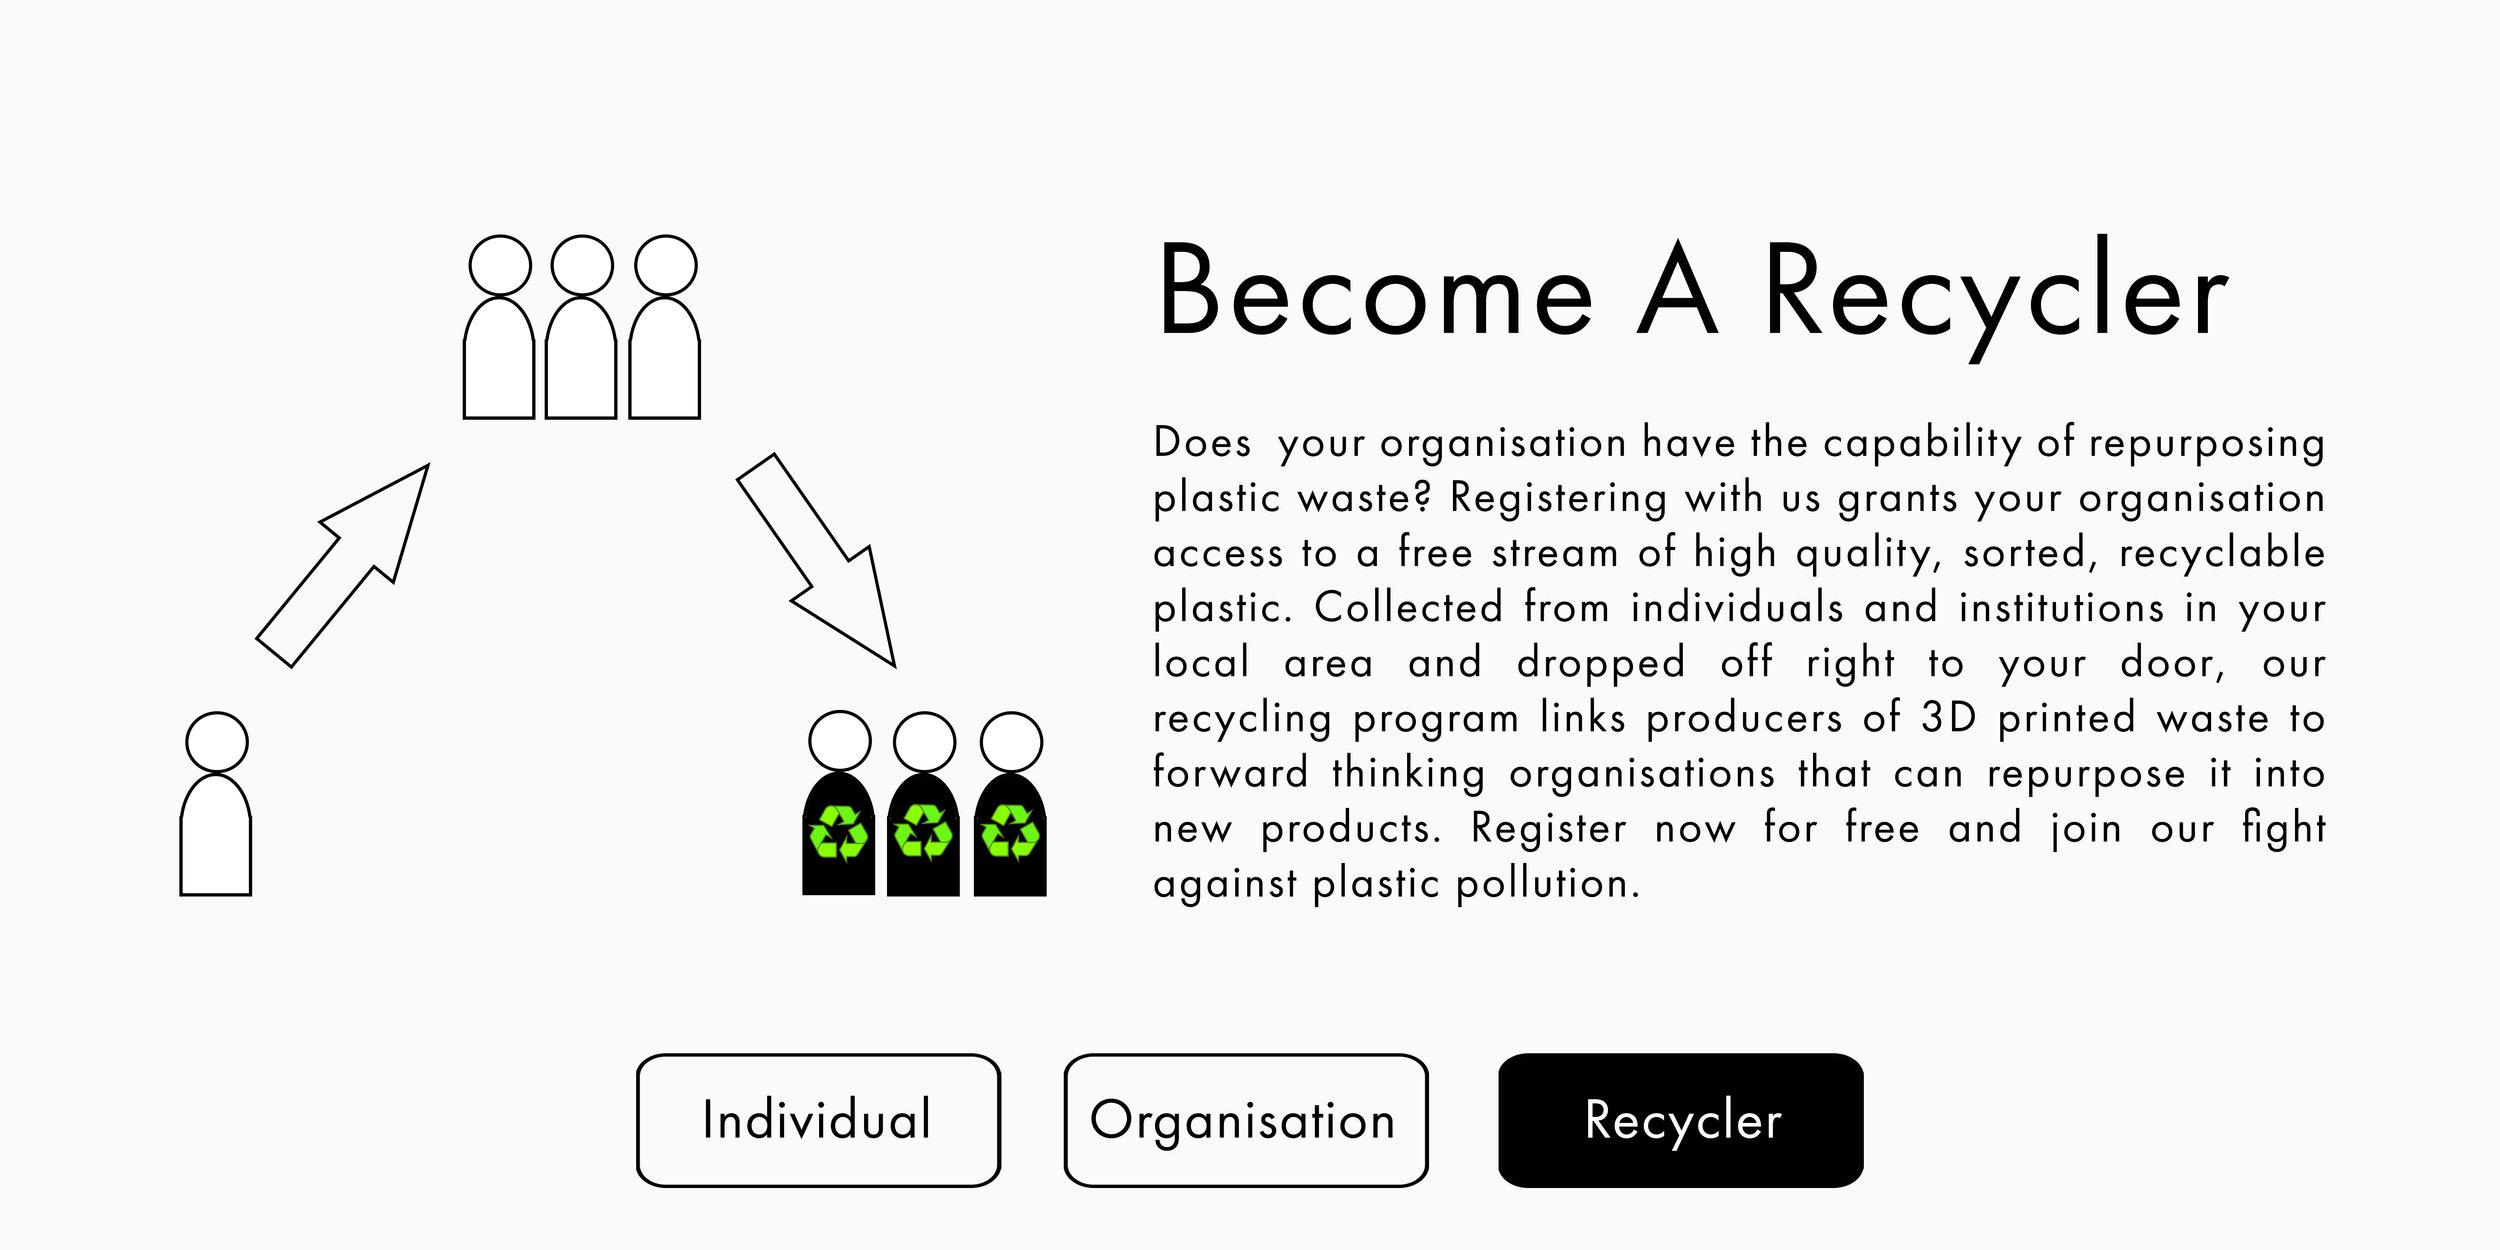 Recycler.jpg